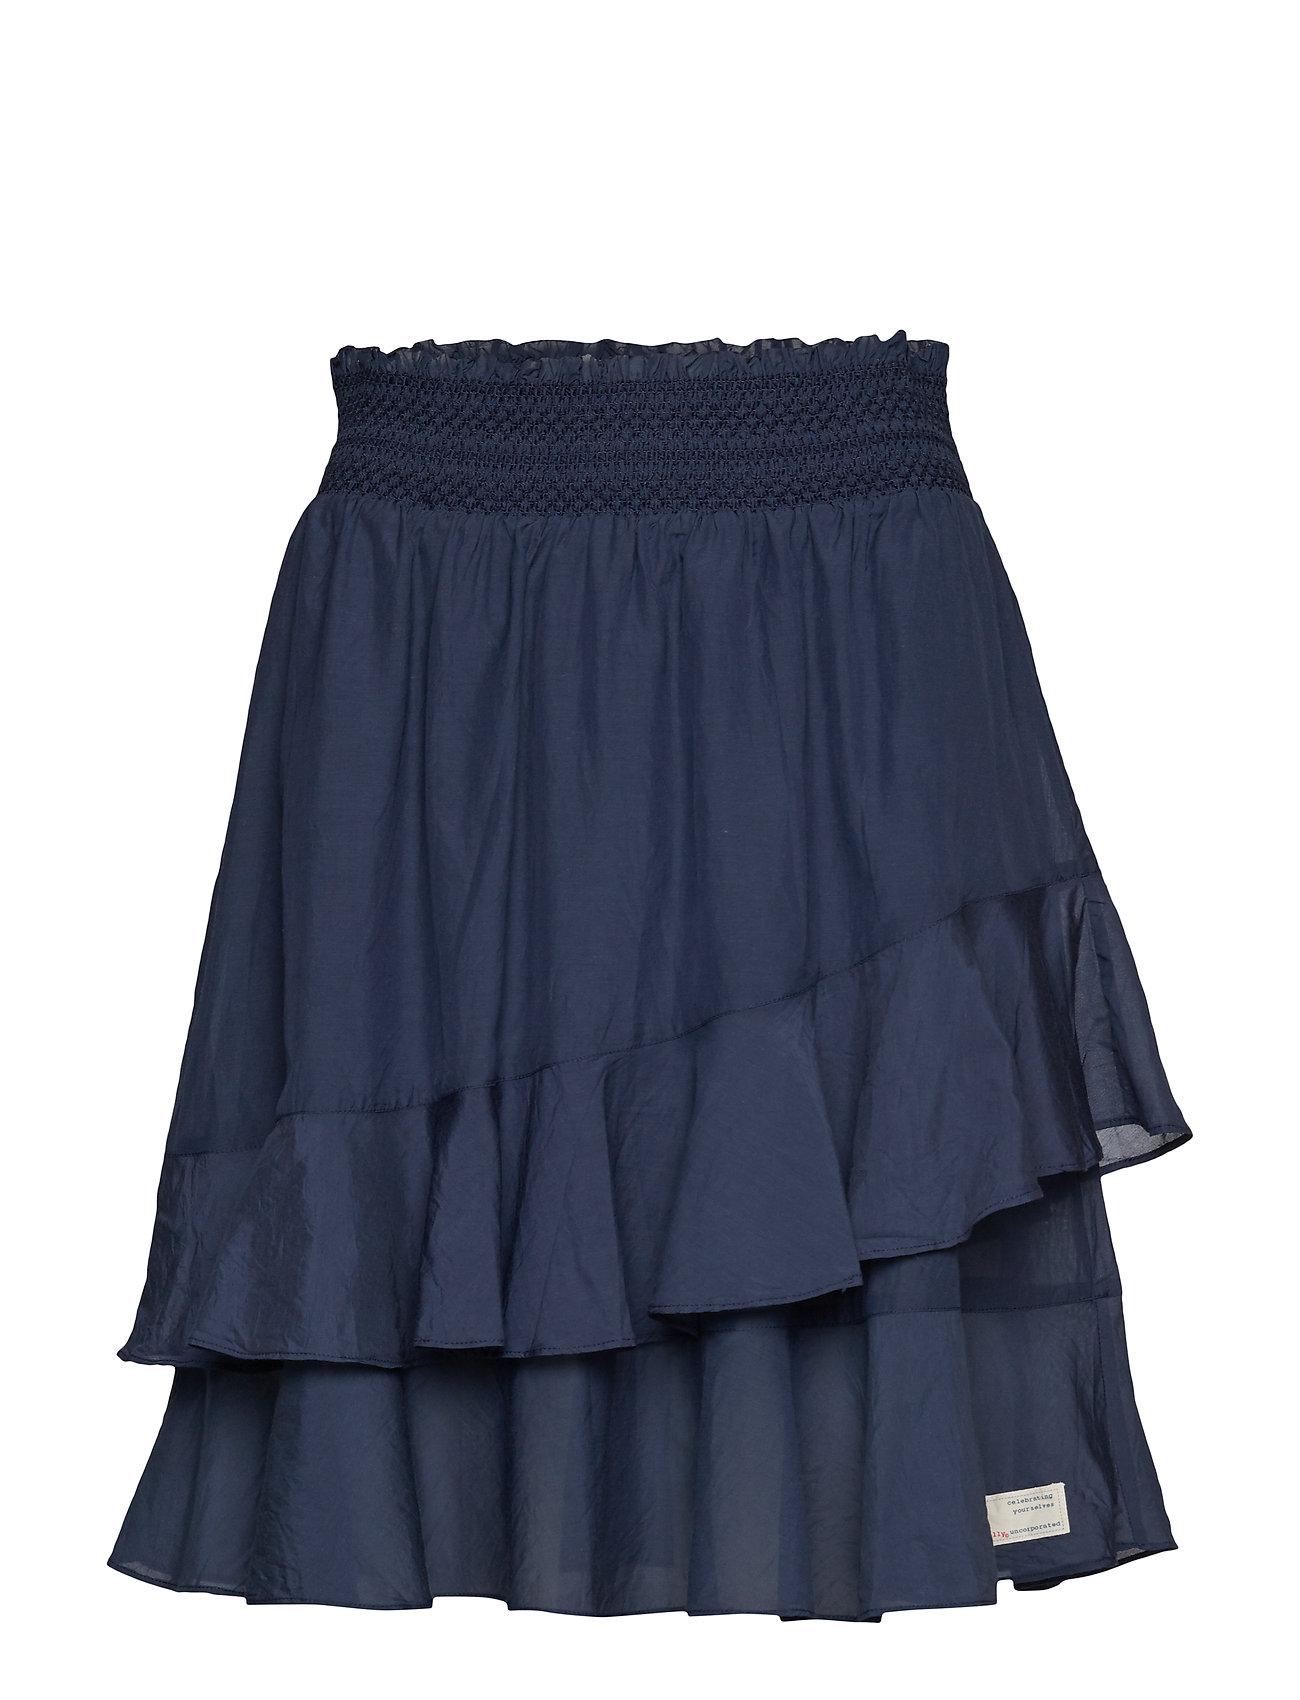 ODD MOLLY majestic skirt - DARK BLUE